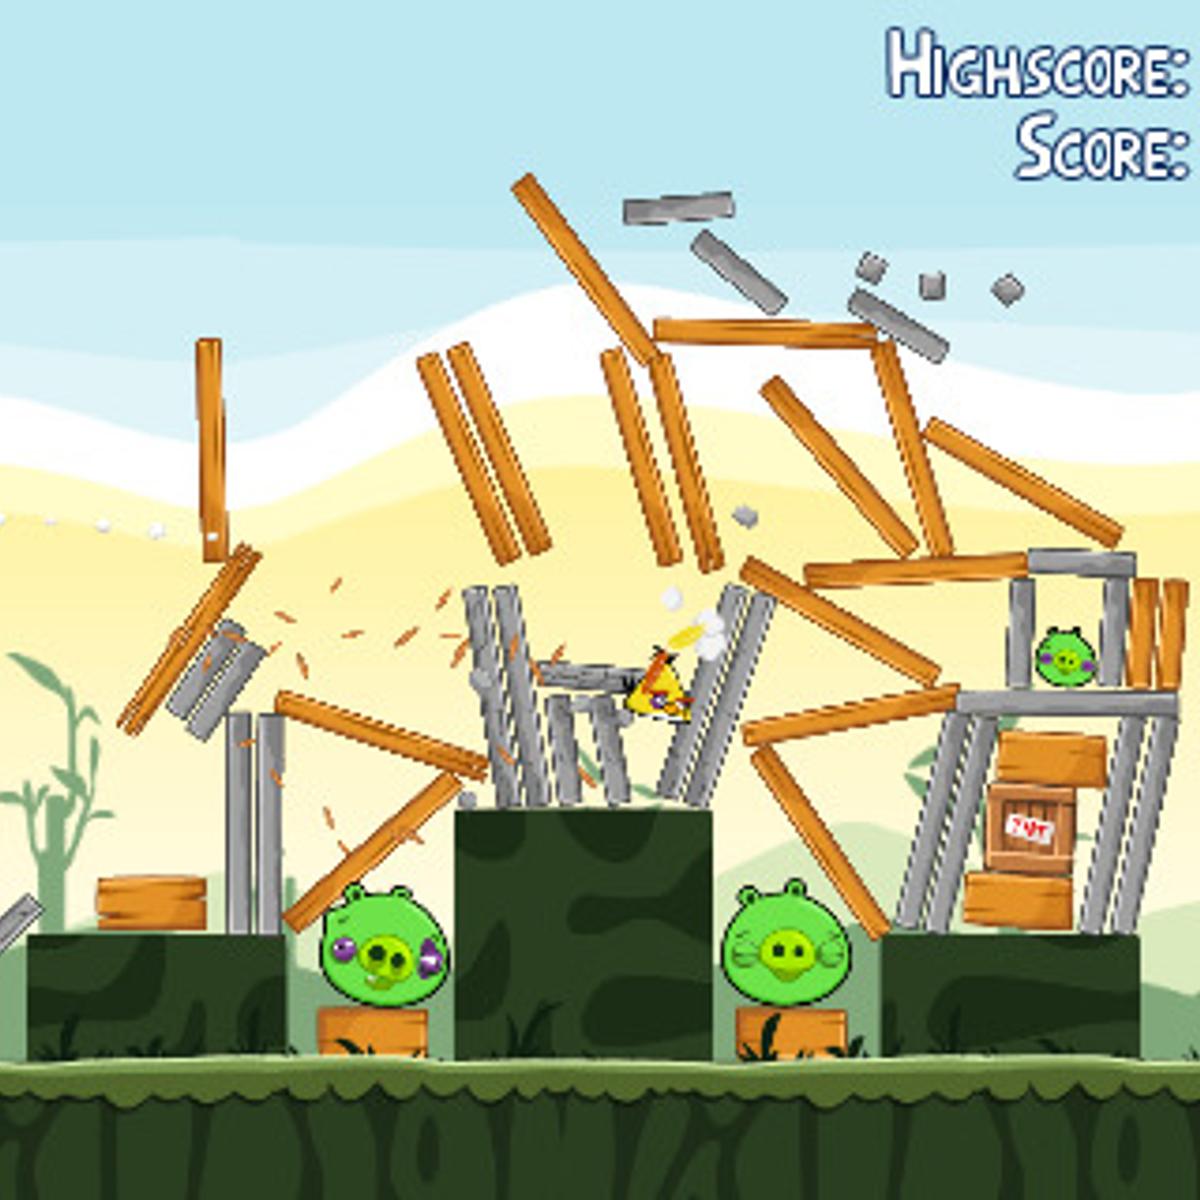 Angry Birds Alternatives and Similar Games - AlternativeTo.net